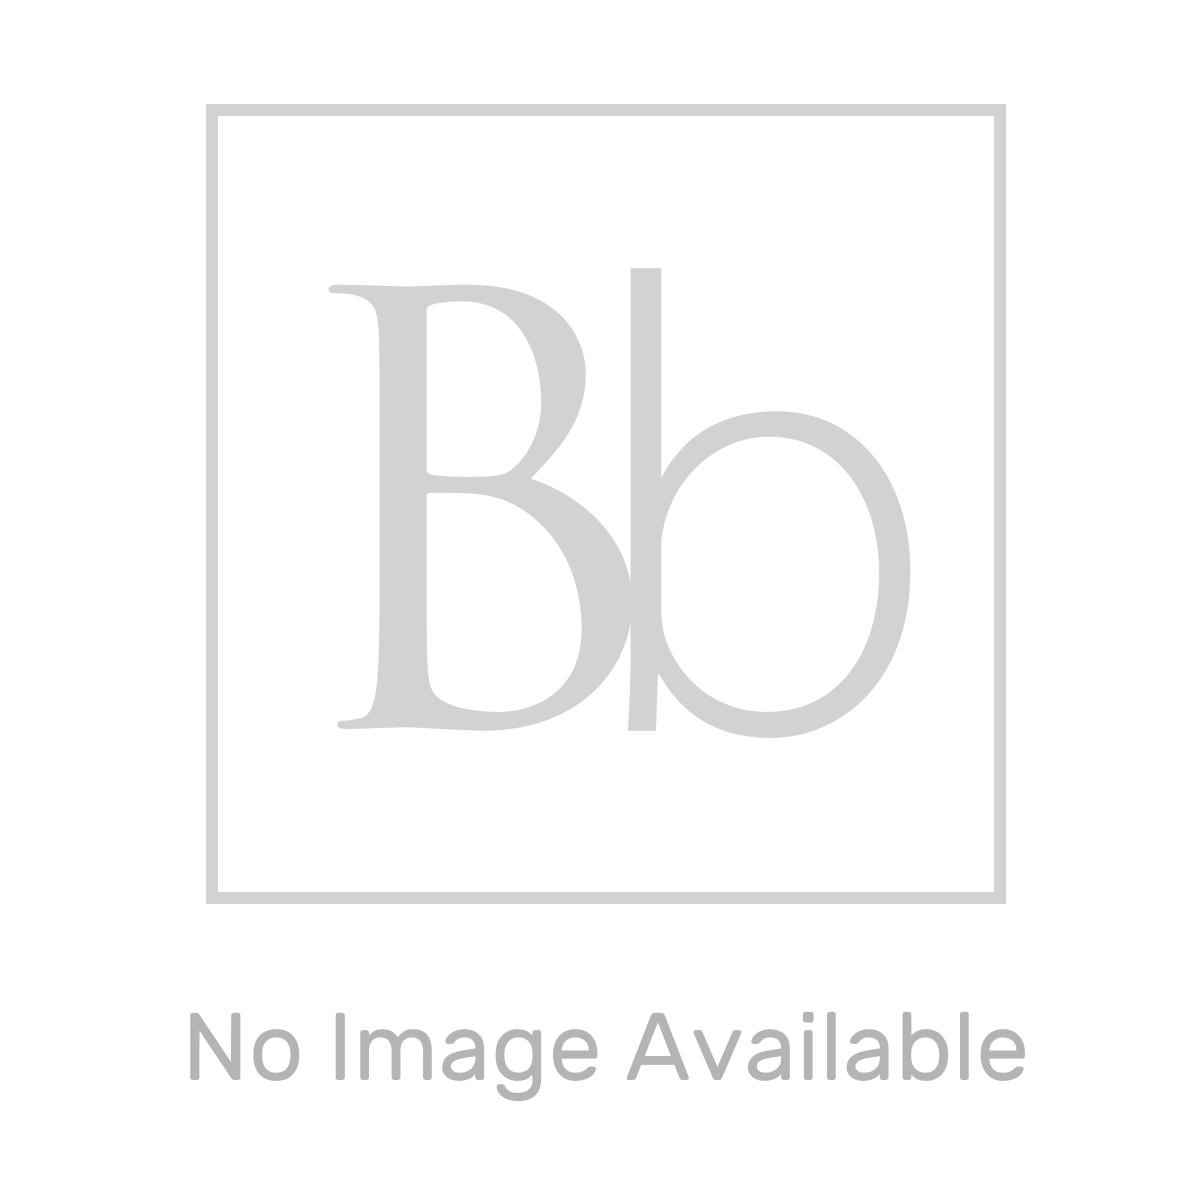 York White Ash Bath Panel 750mm